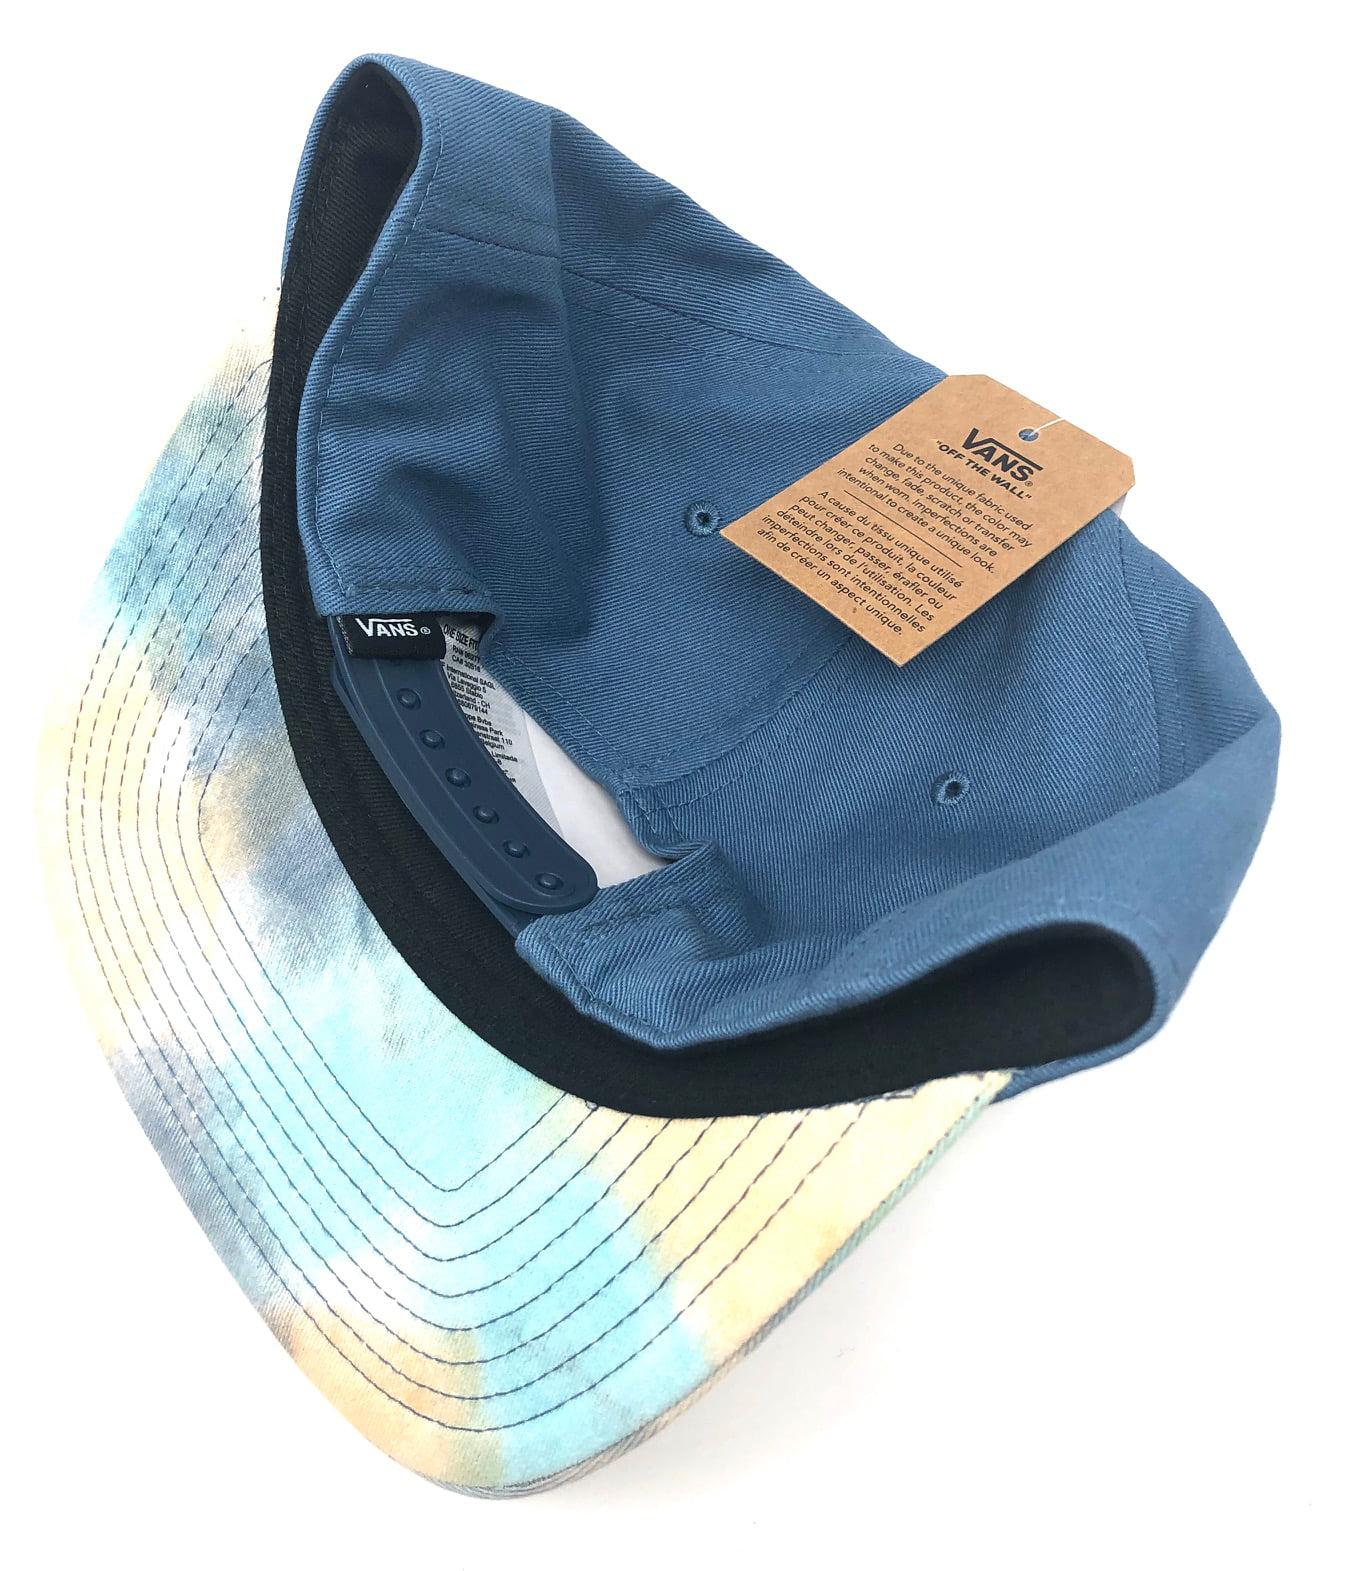 51294d50b Vans Off The Wall Men's Allover It Snapback Hat Cap - Blue/Tie Dye